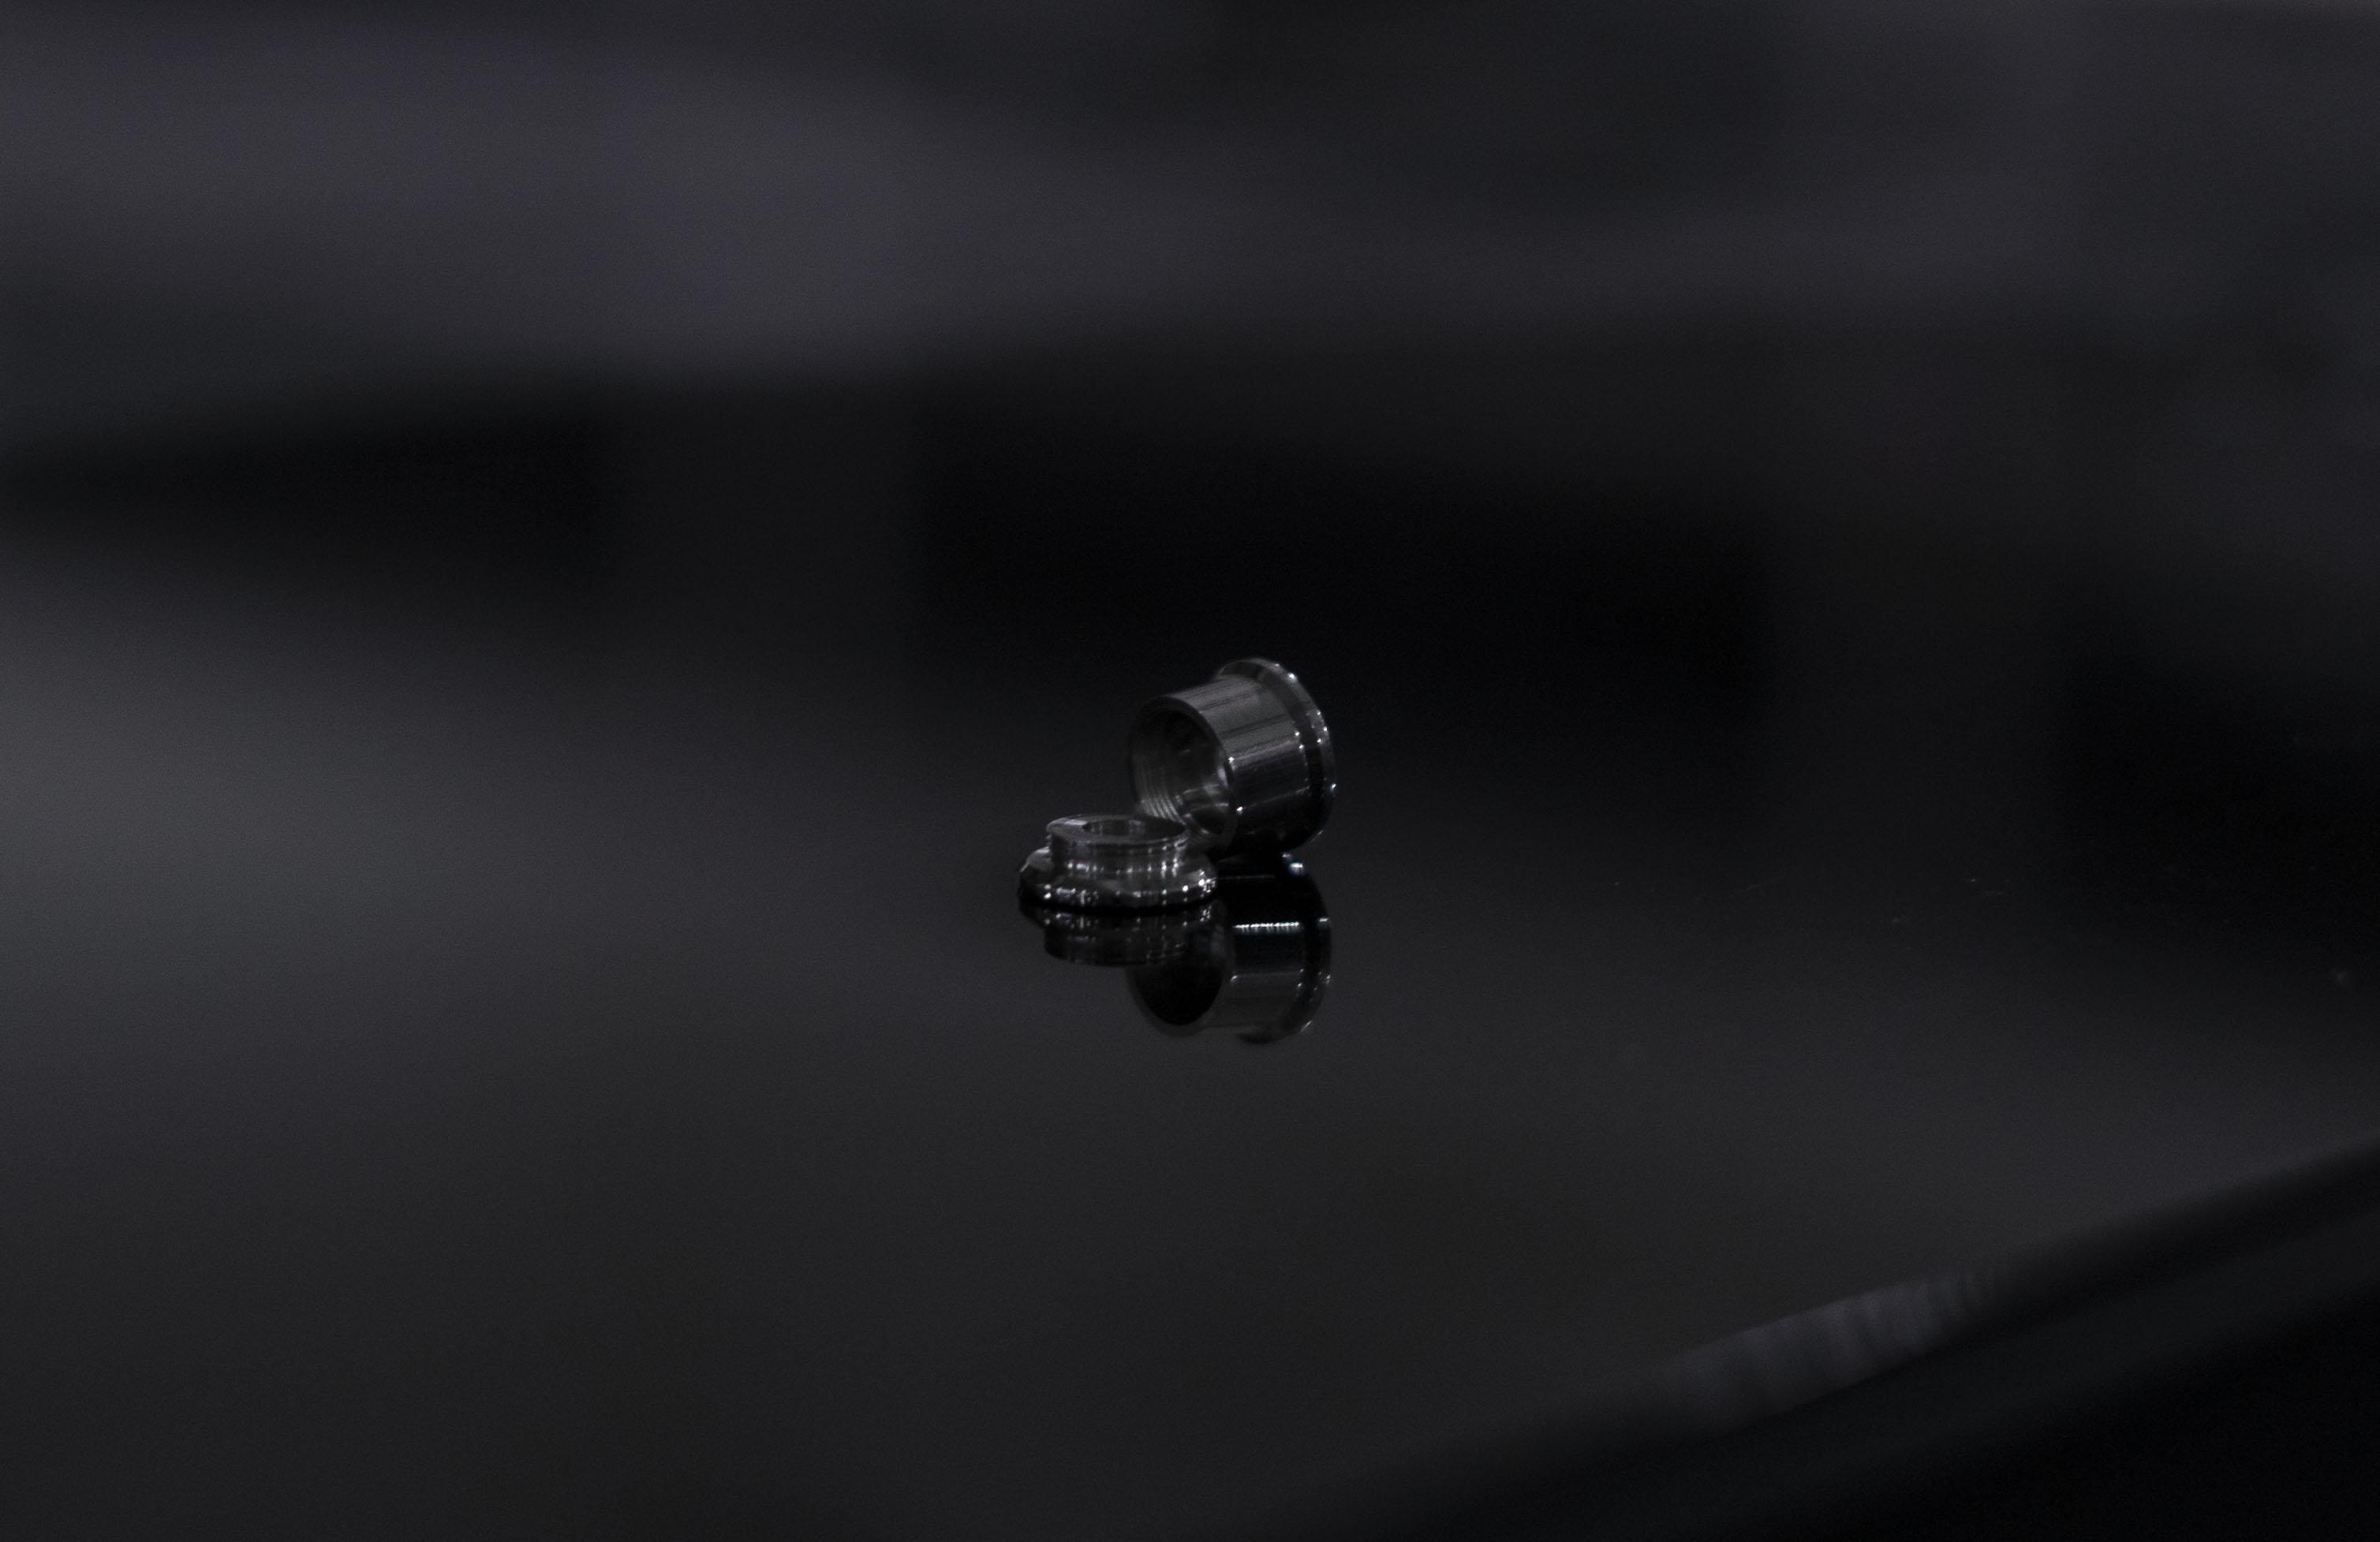 tunel com sistema de rosca